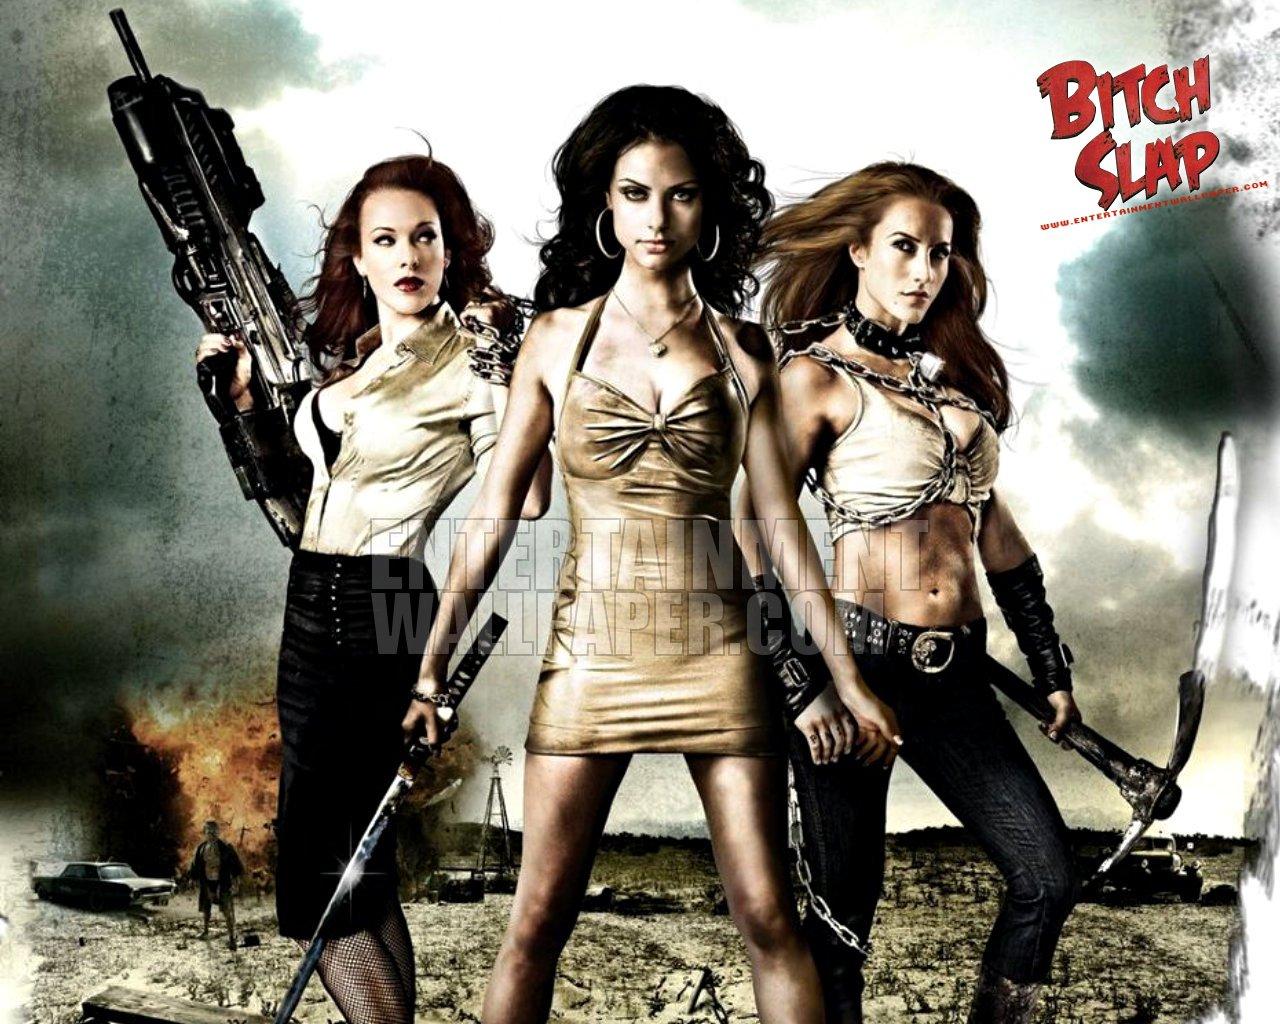 Bad bitch three girls